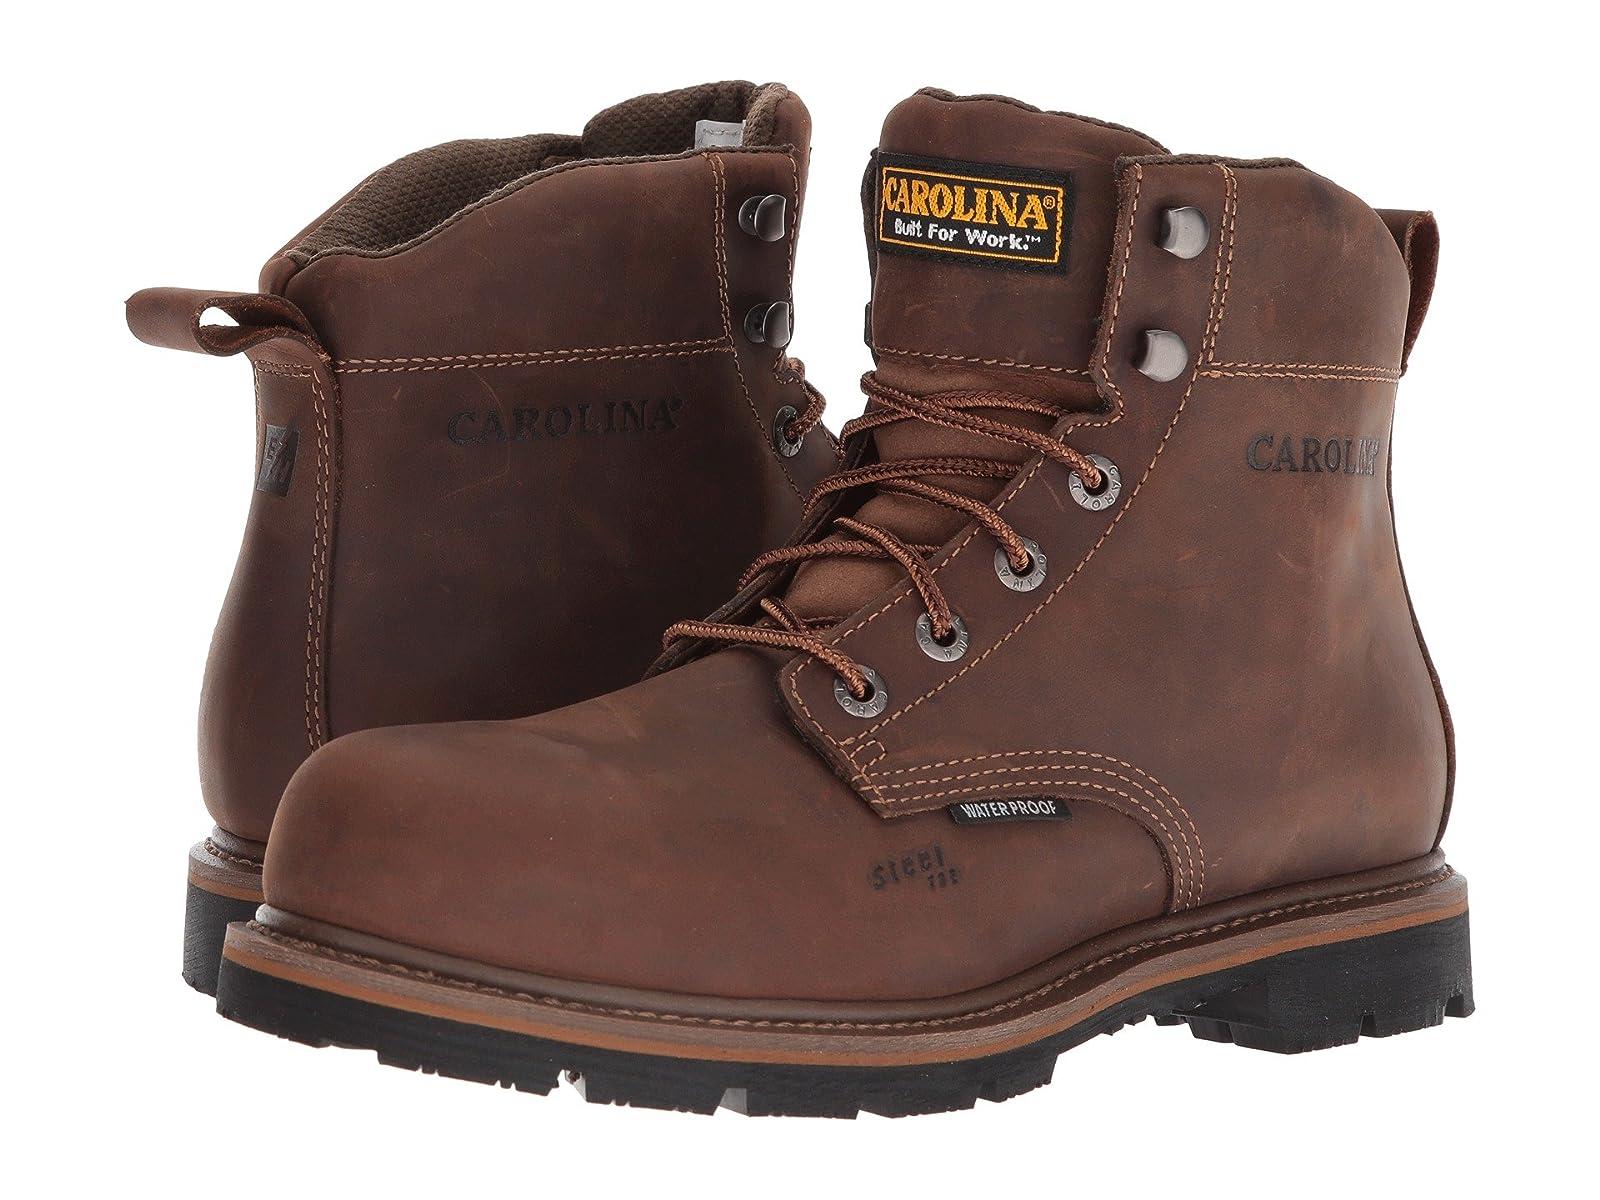 "Carolina 6"" Waterproof Work Boot CA9536 CA9536 Boot cbb2c8"